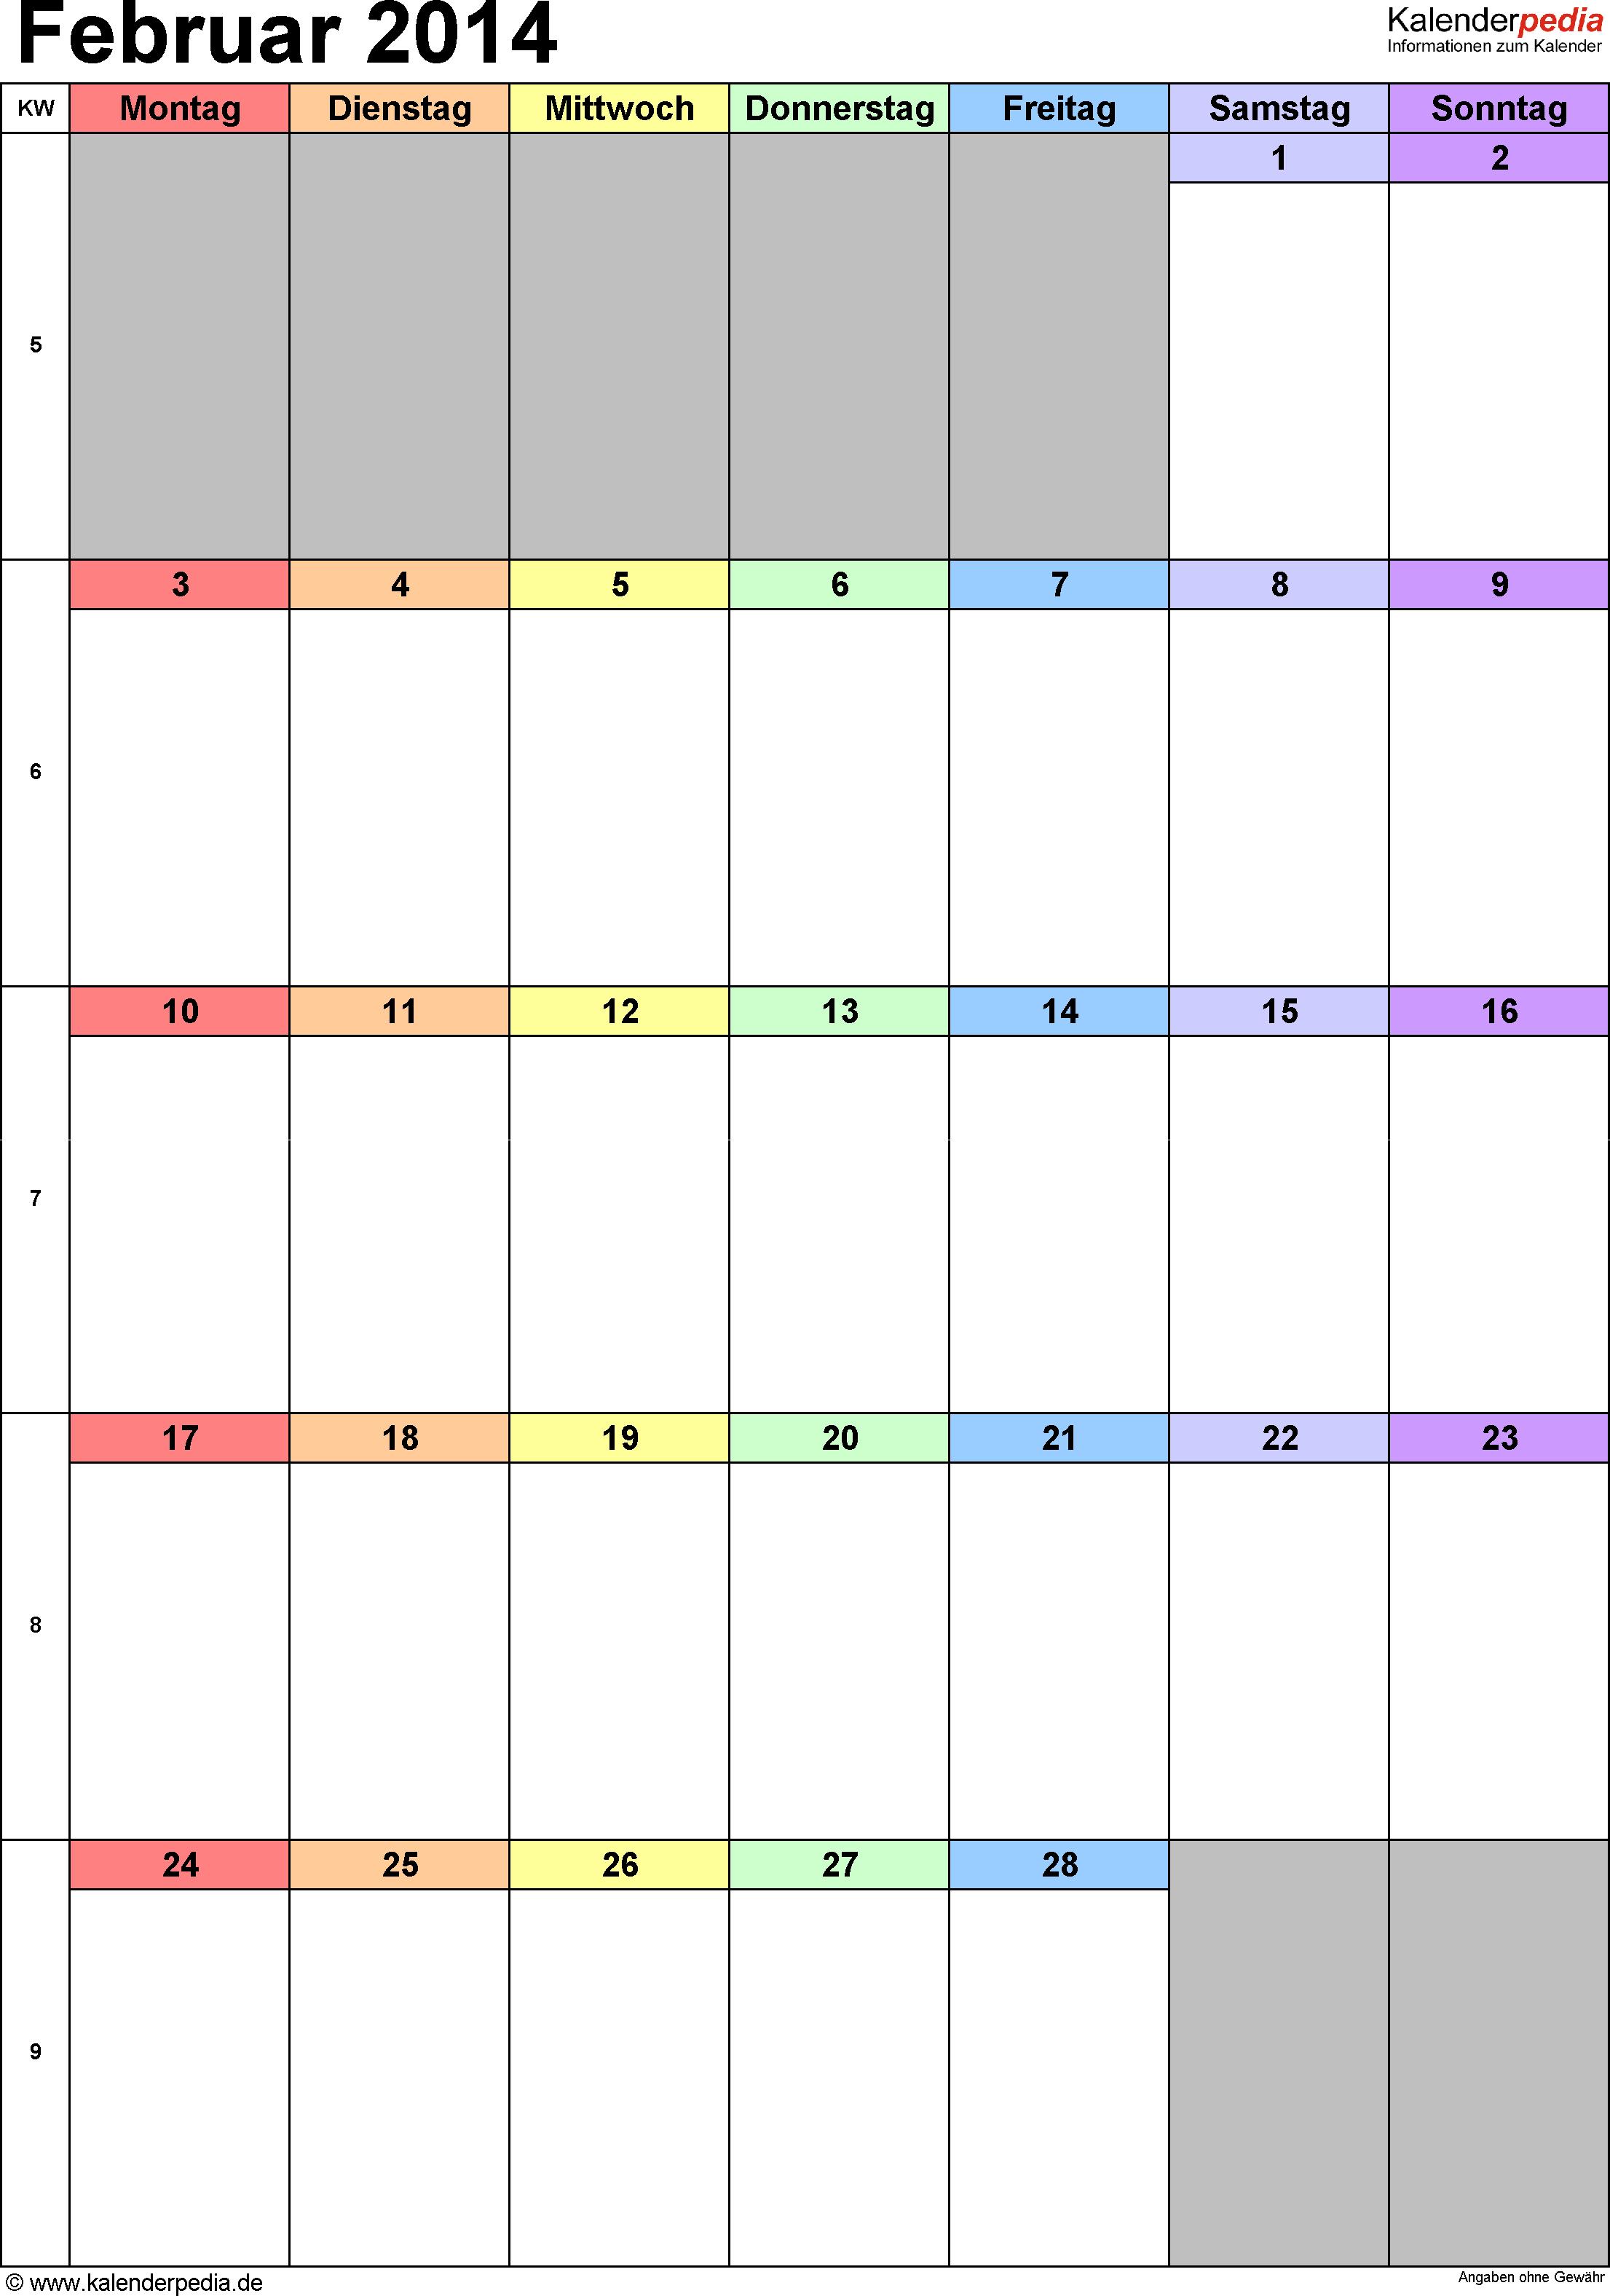 Kalender Februar 2014 (Hochformat) als Excel-Vorlage